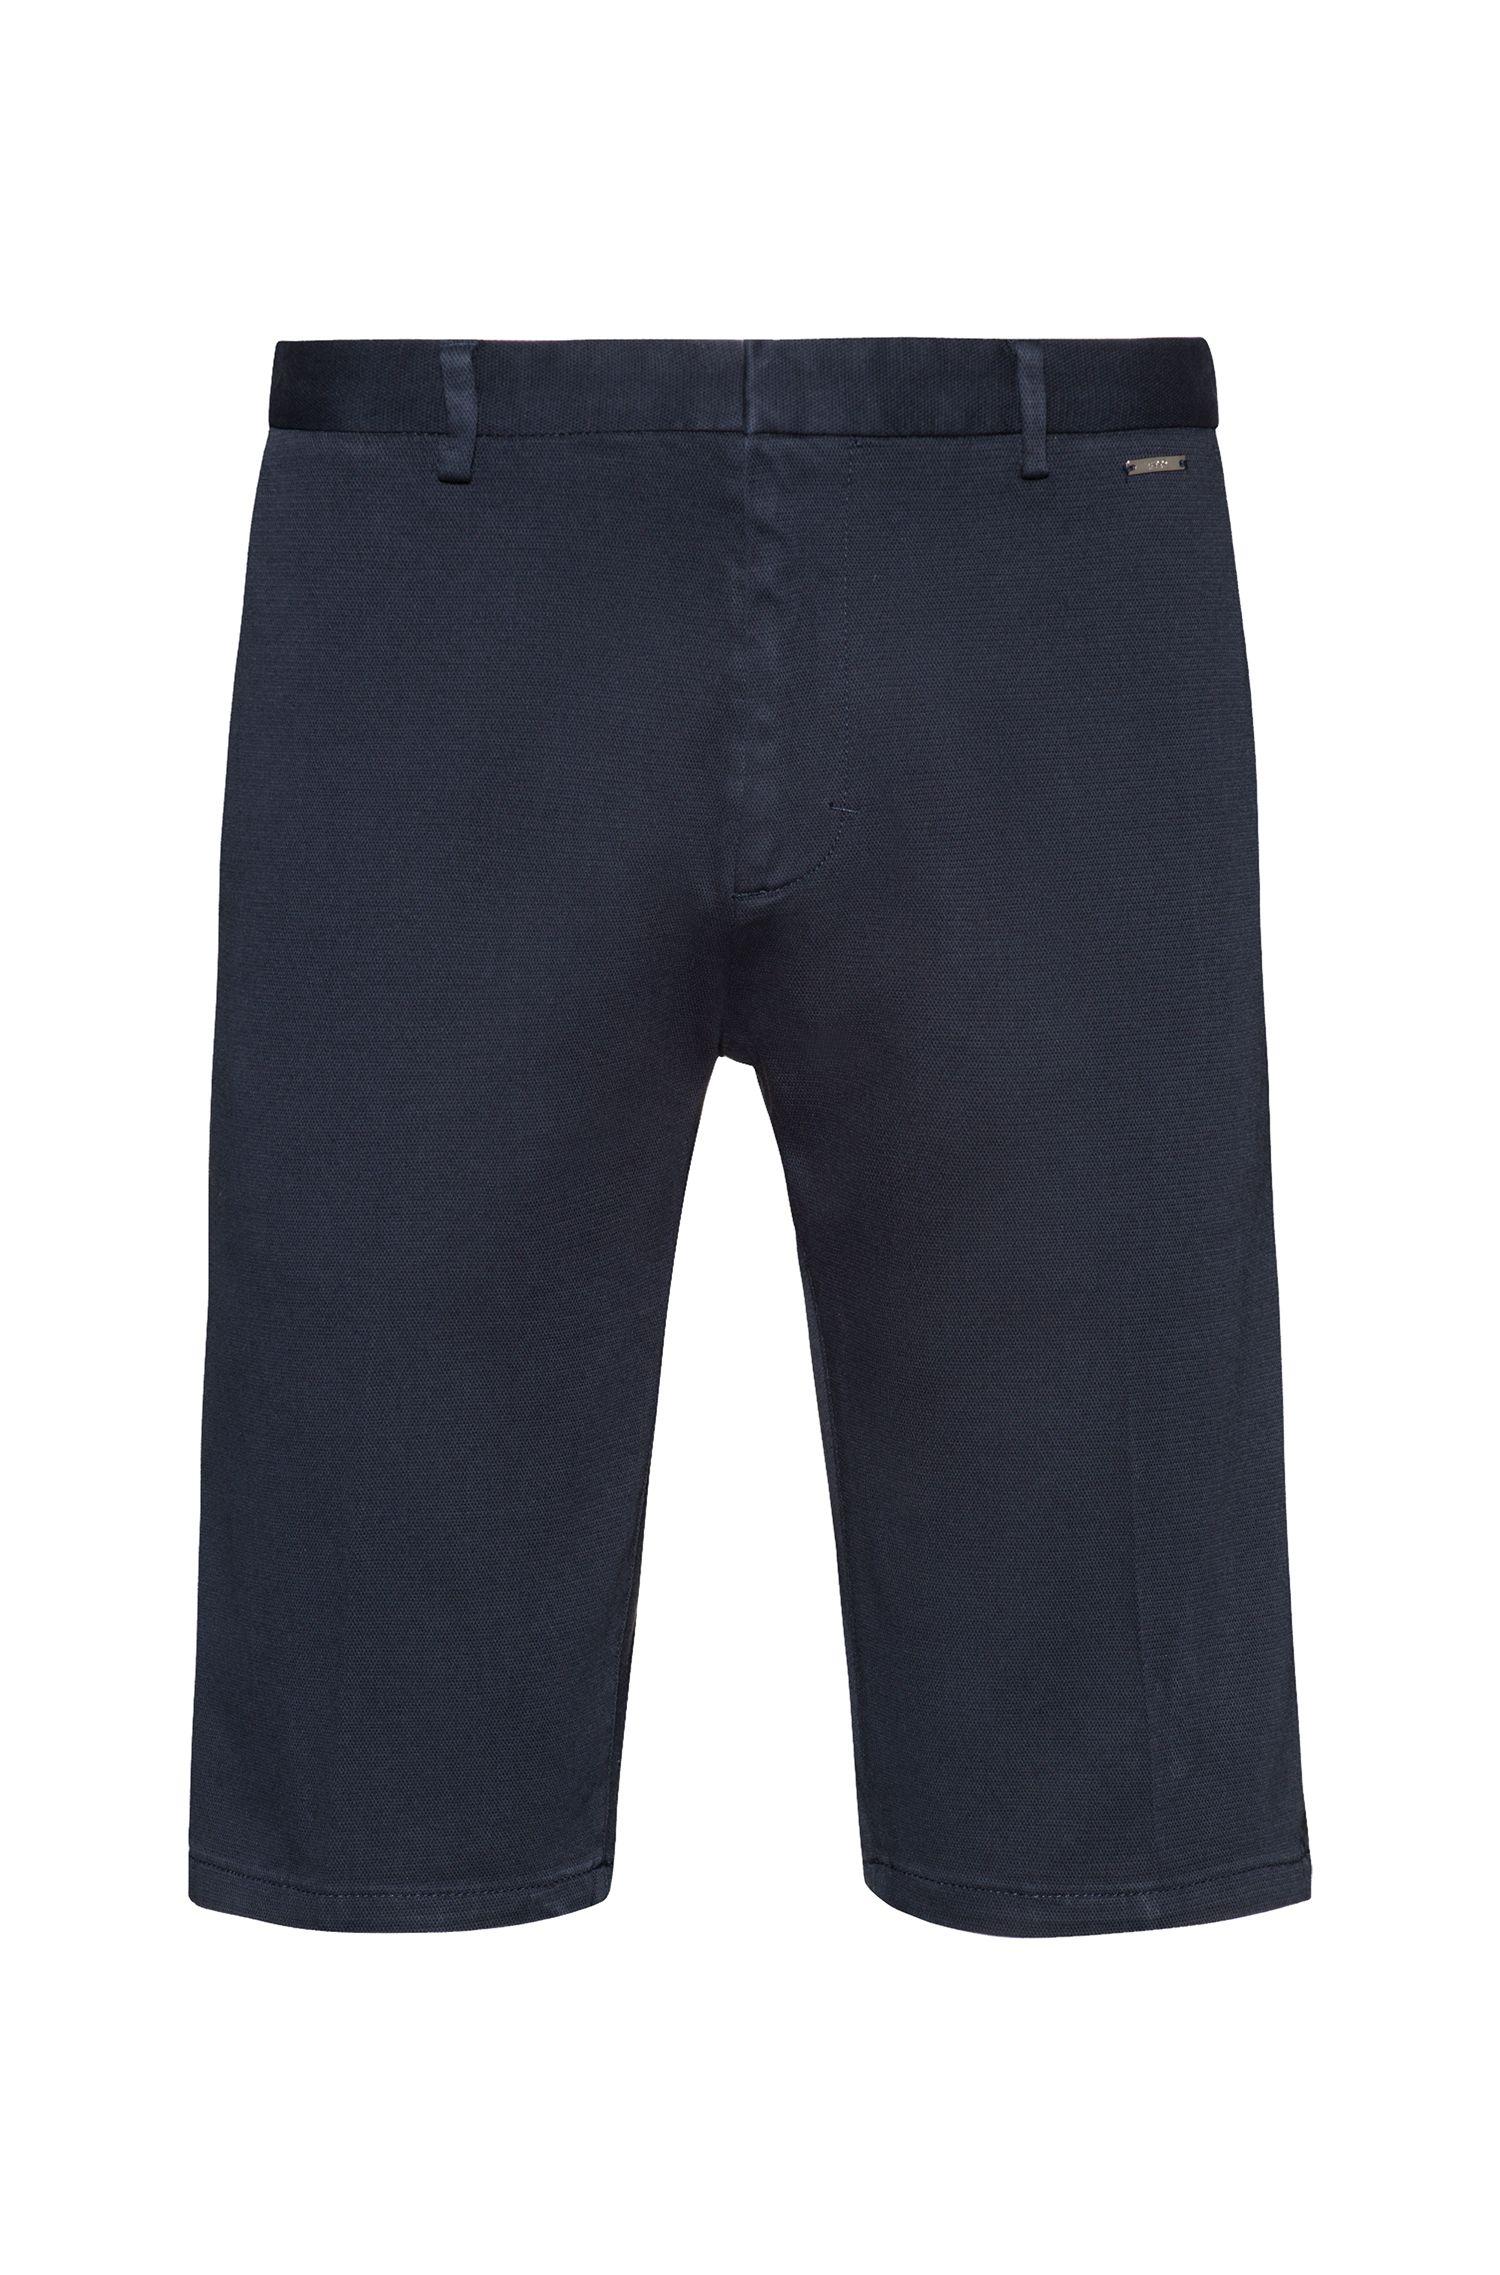 Slim-leg shorts in overdyed stretch cotton, Dark Blue